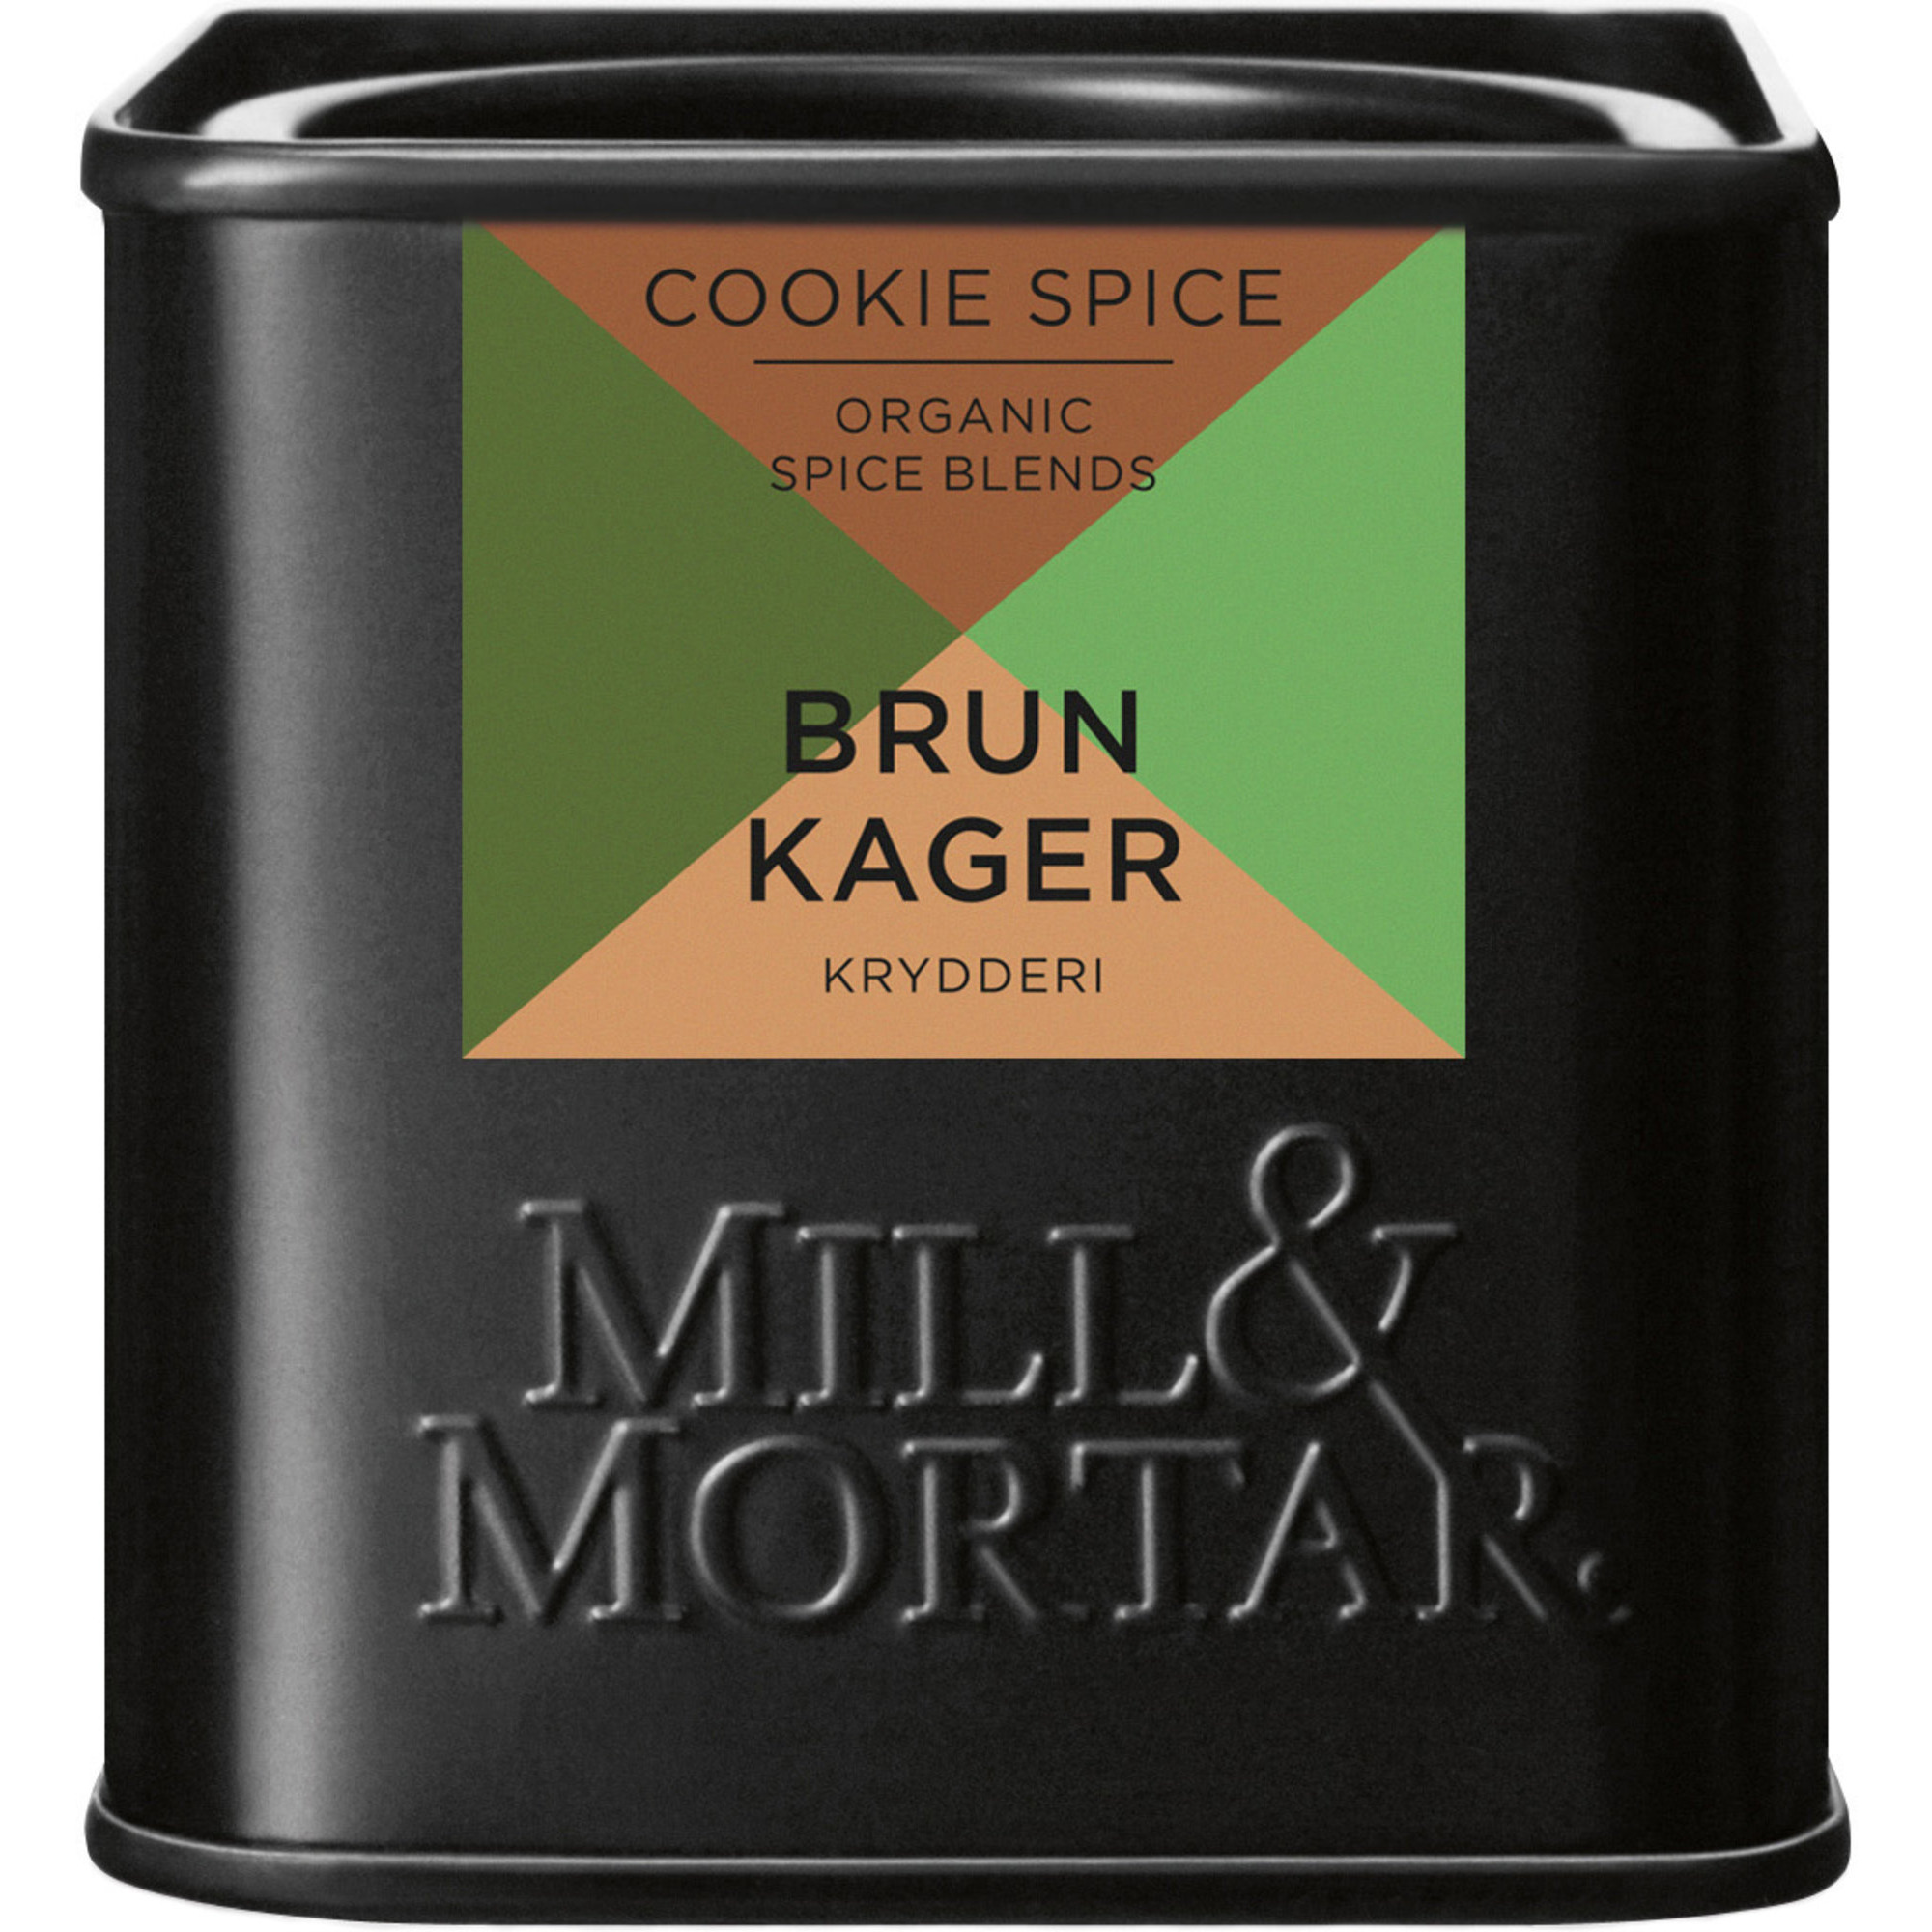 Mill & Mortar Brunkakor Cookie Spice 50 g.